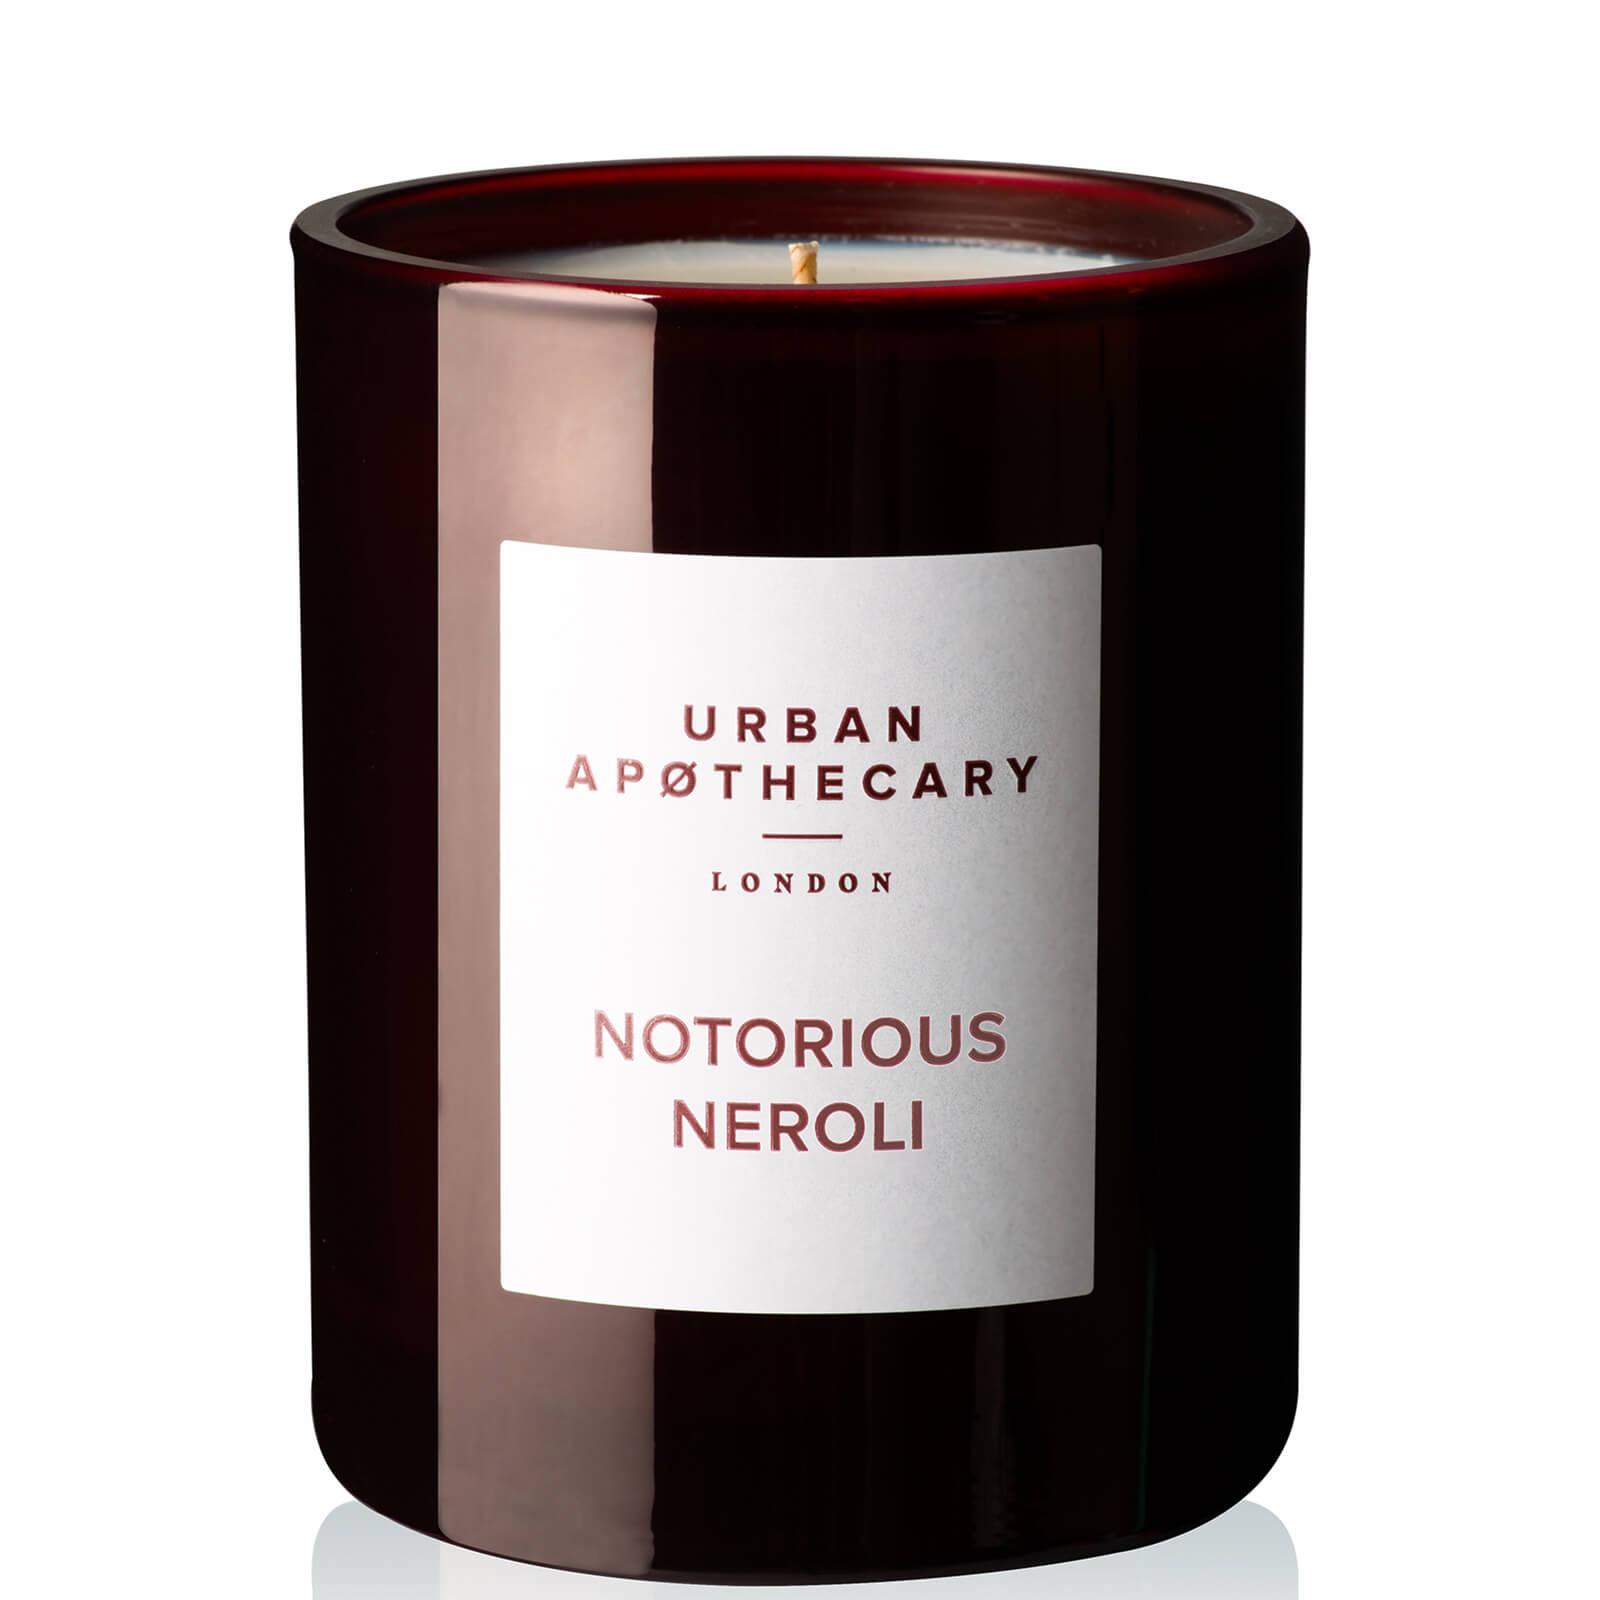 Urban Apothecary Notorious Neroli Luxury Candle 300g